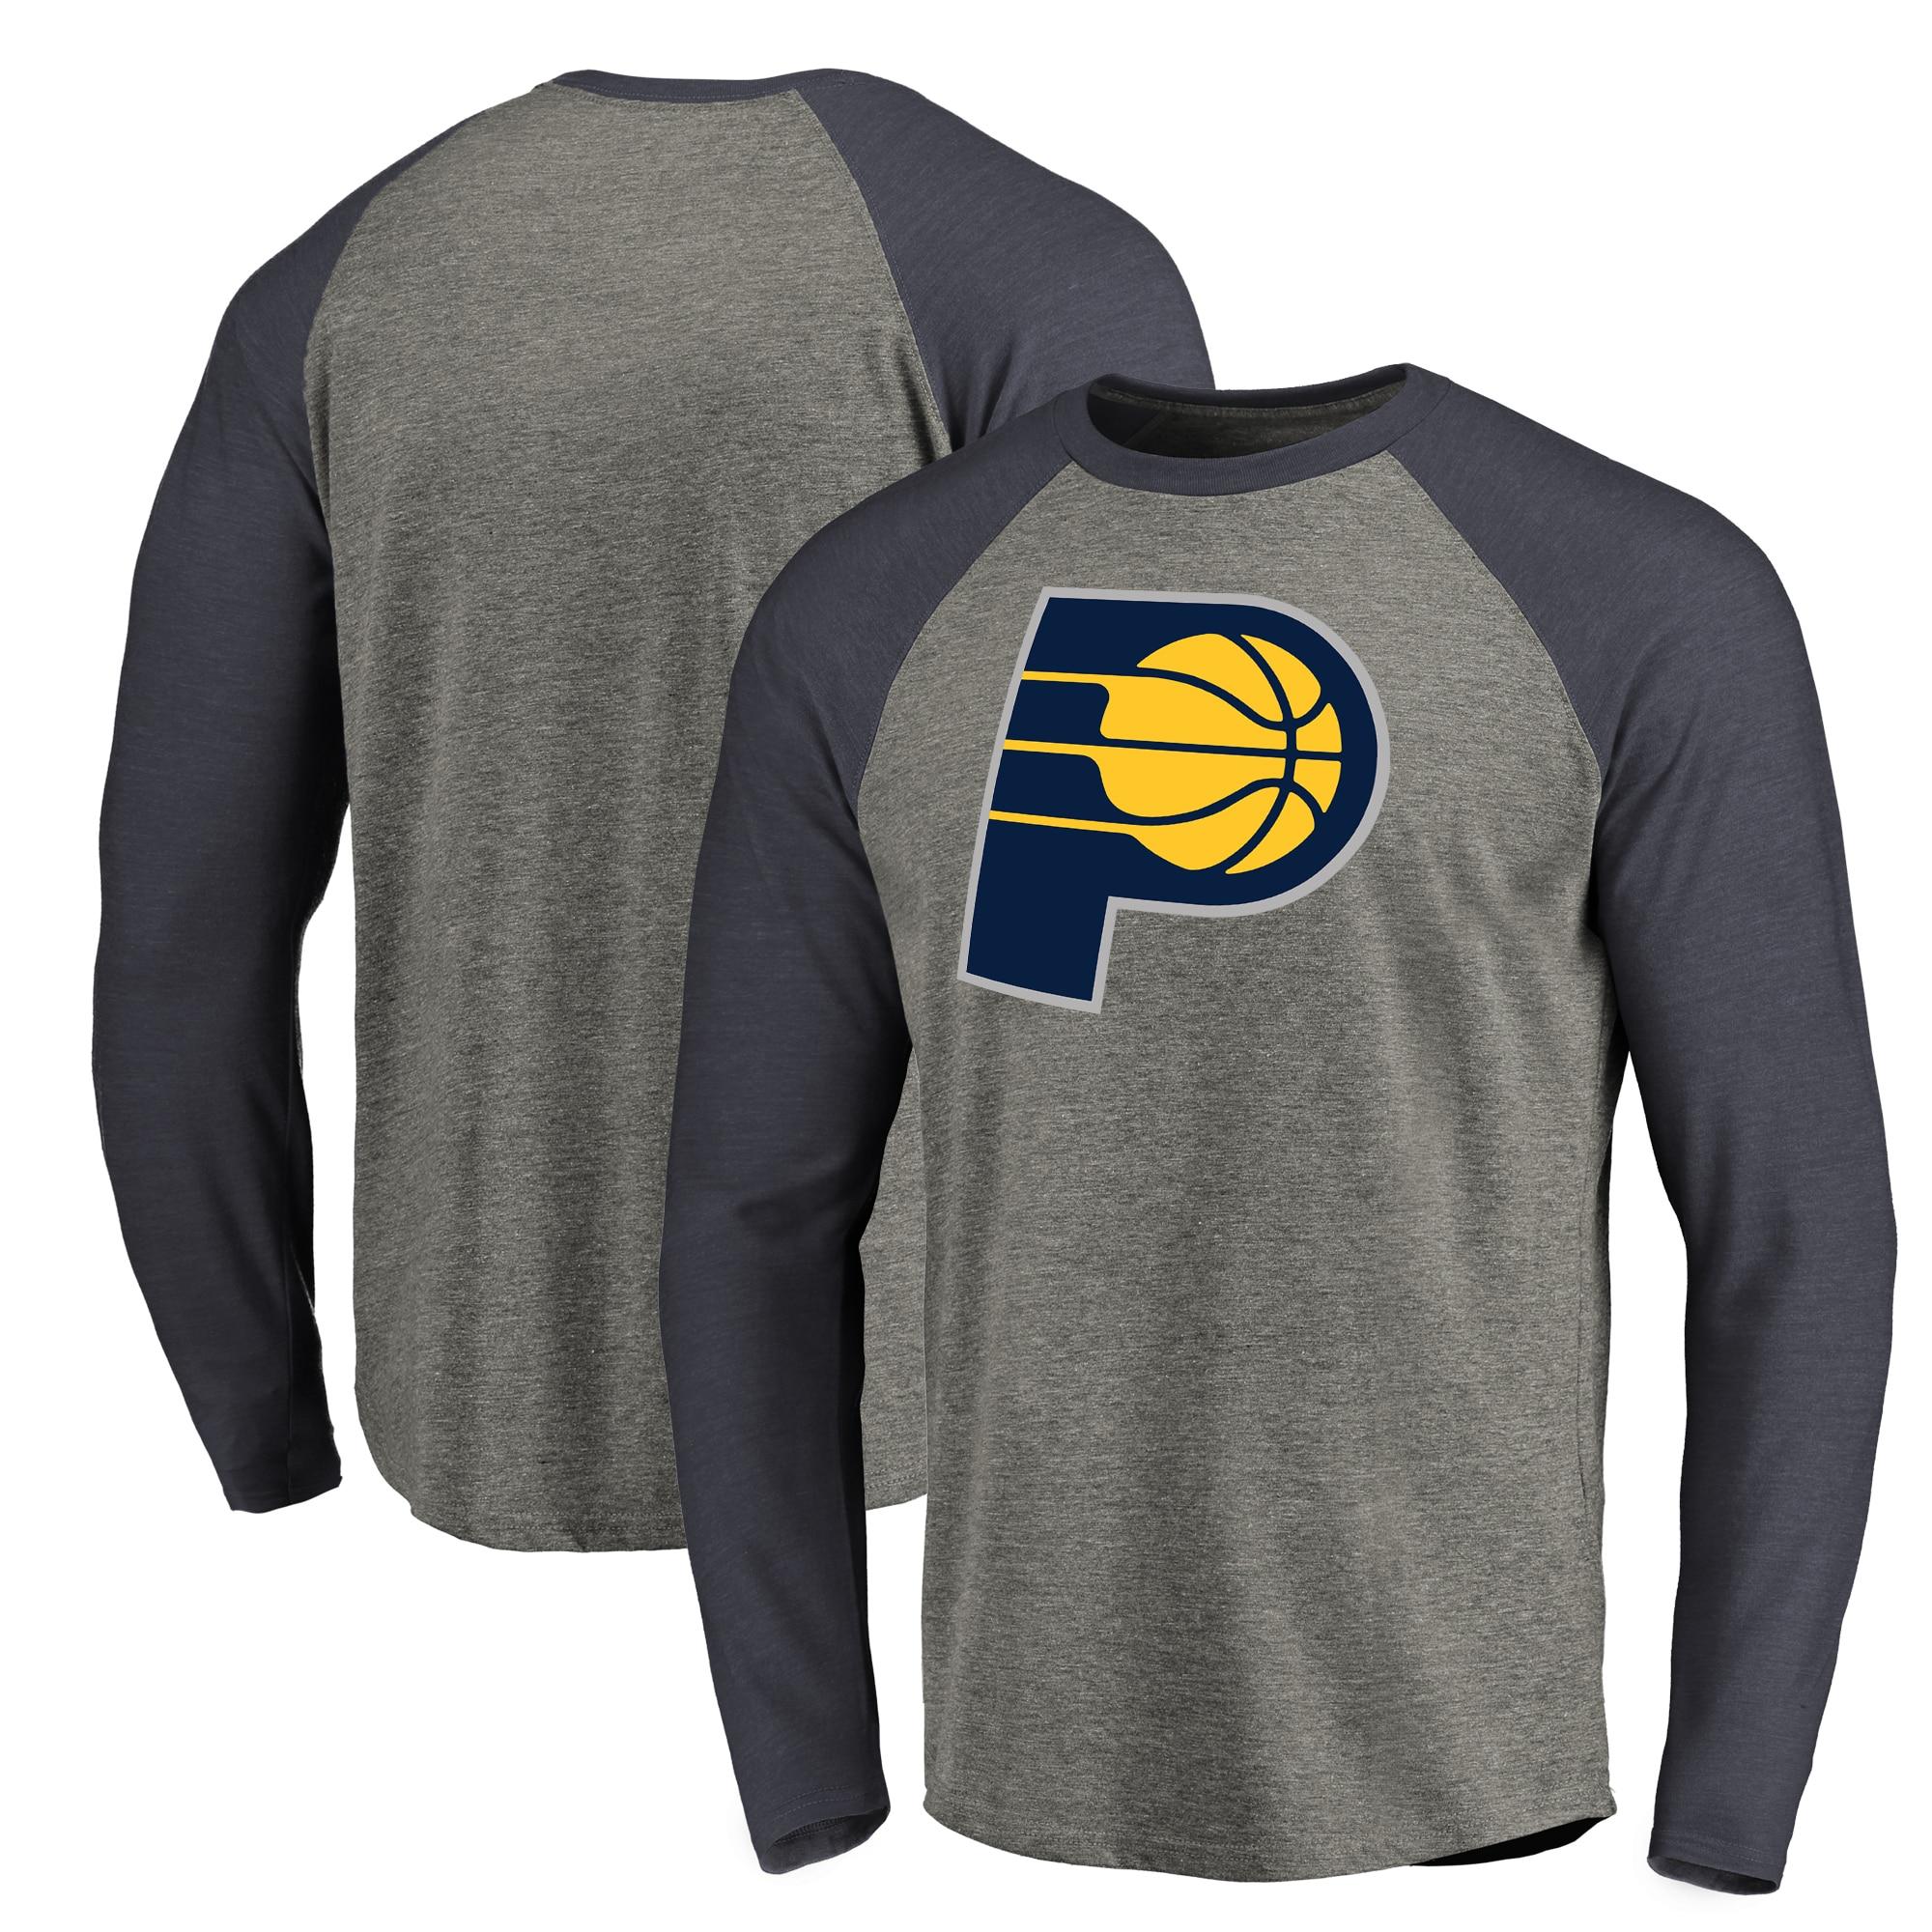 Indiana Pacers Fanatics Branded Primary Logo Raglan Long Sleeve T-Shirt - Heathered Gray